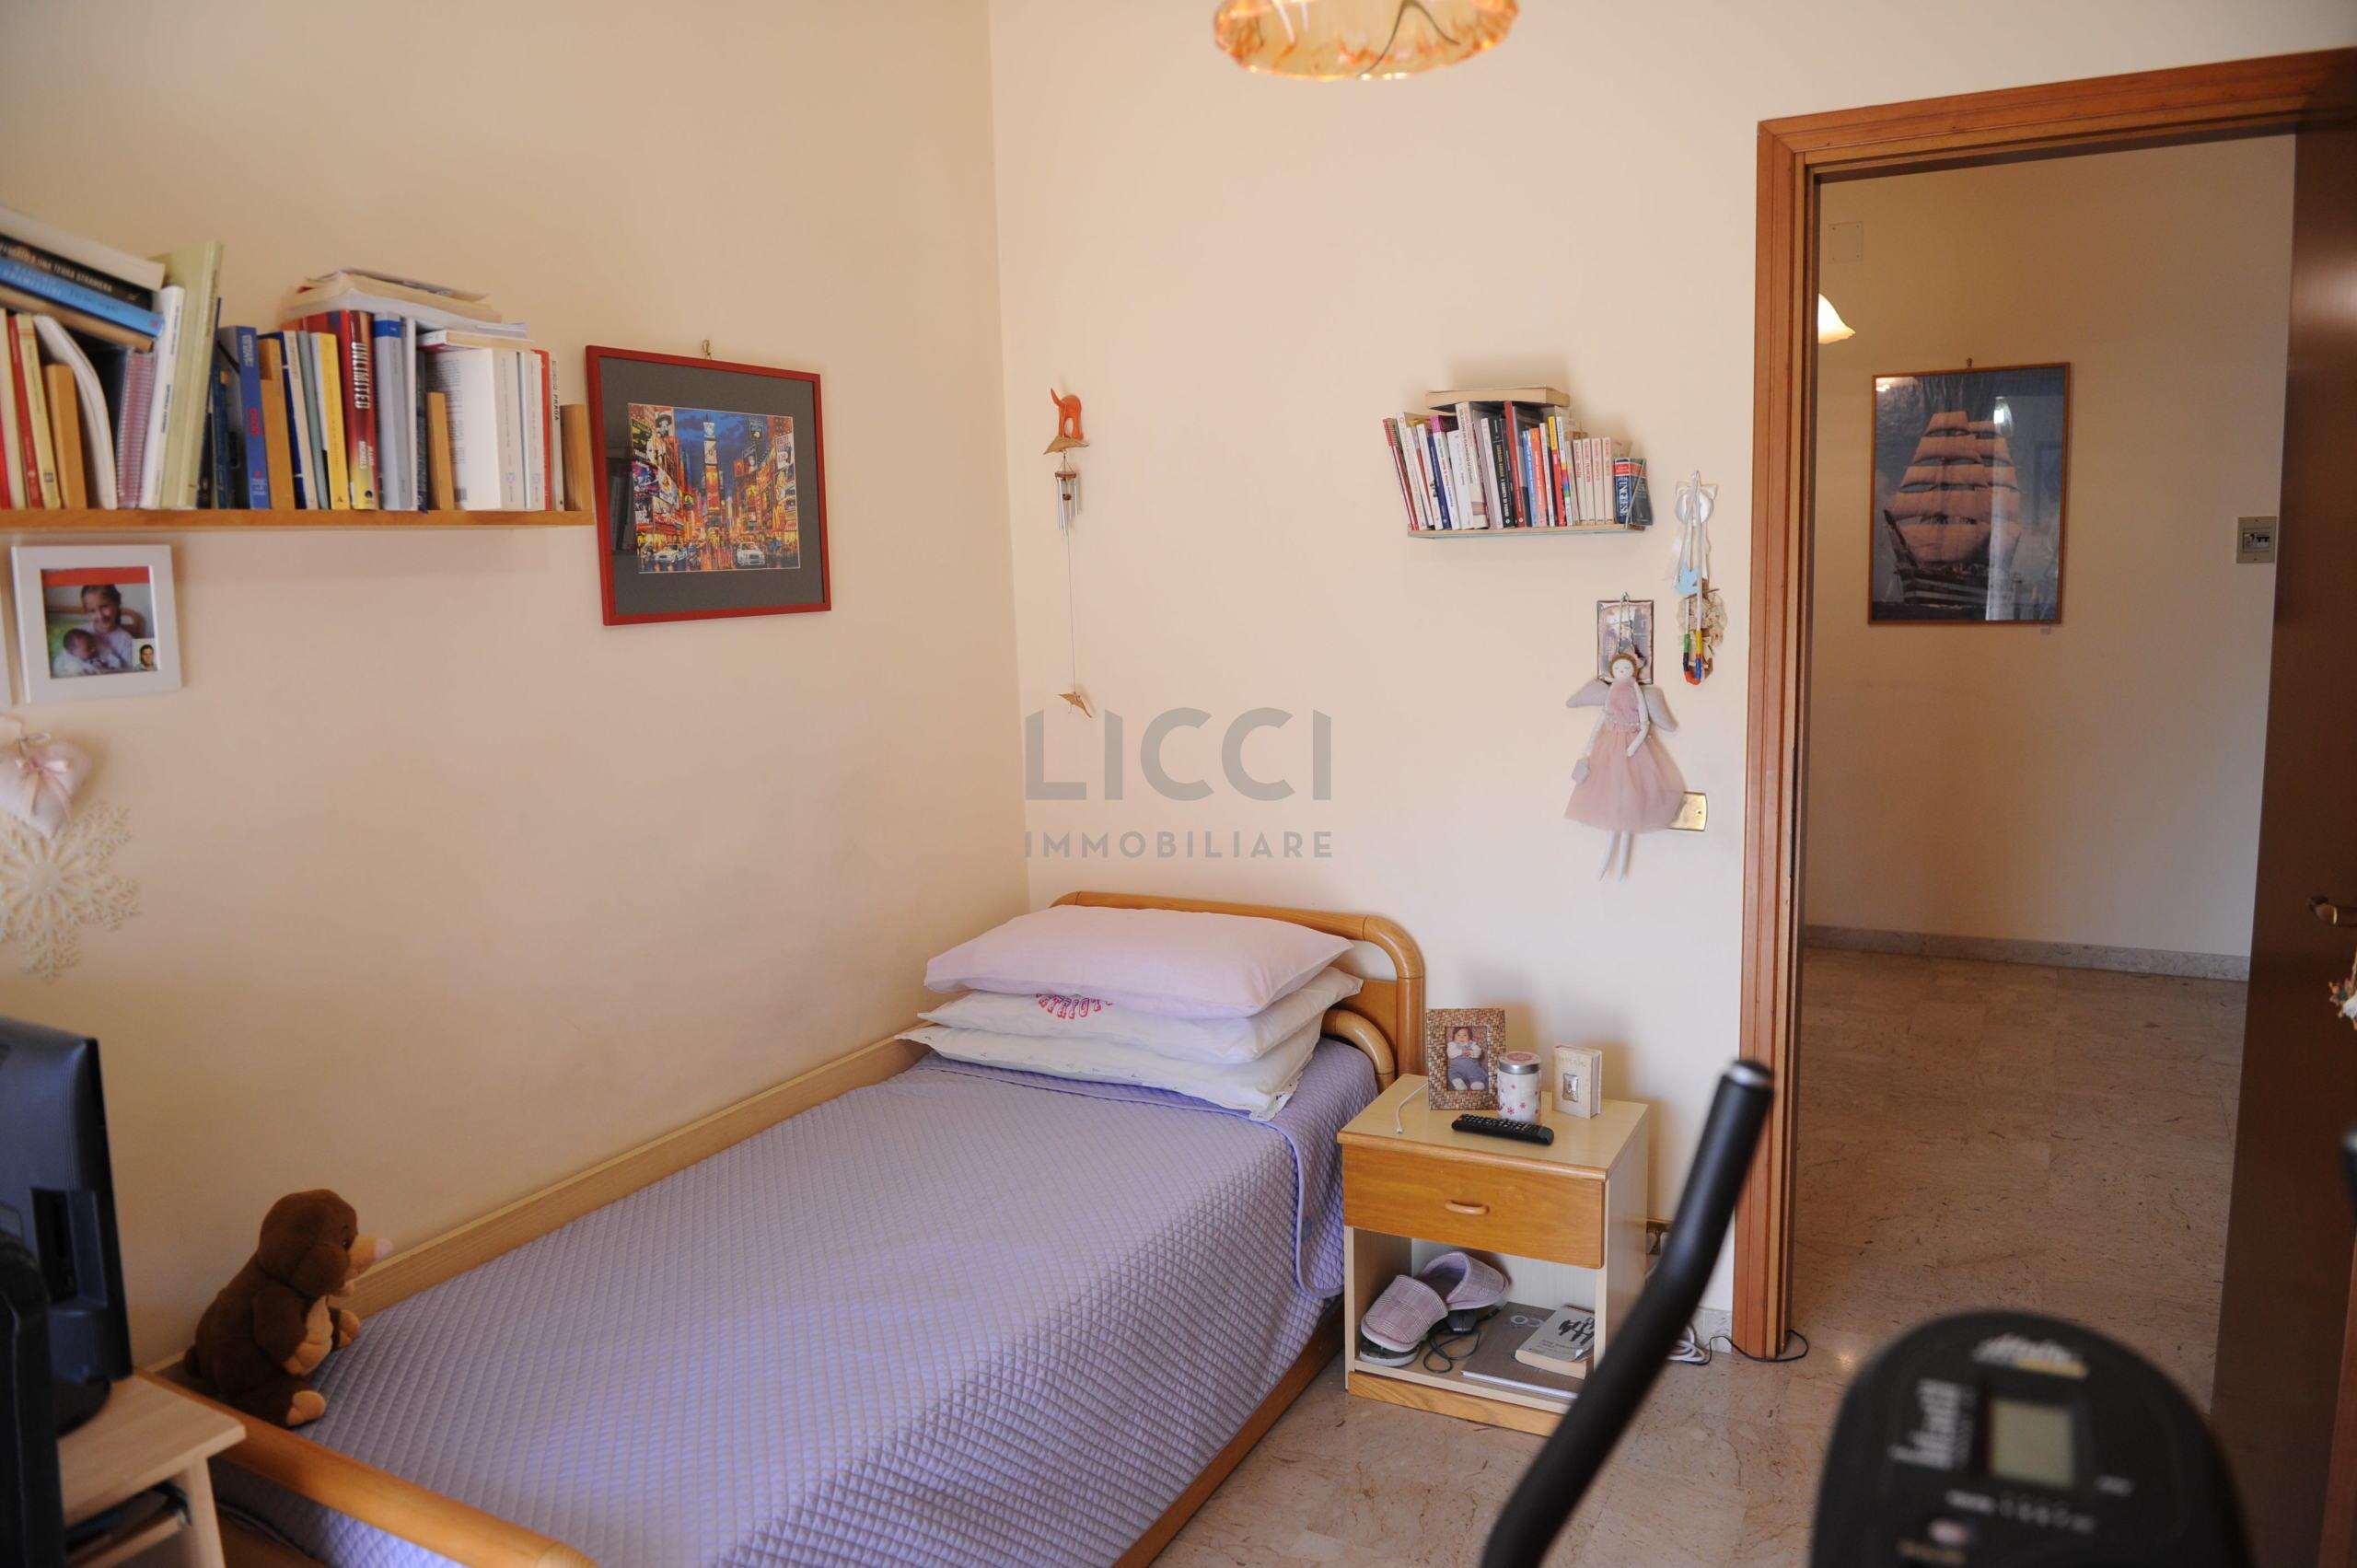 Appartamento a Monopoli Via Papa Giovanni XXIII 45, Periferia